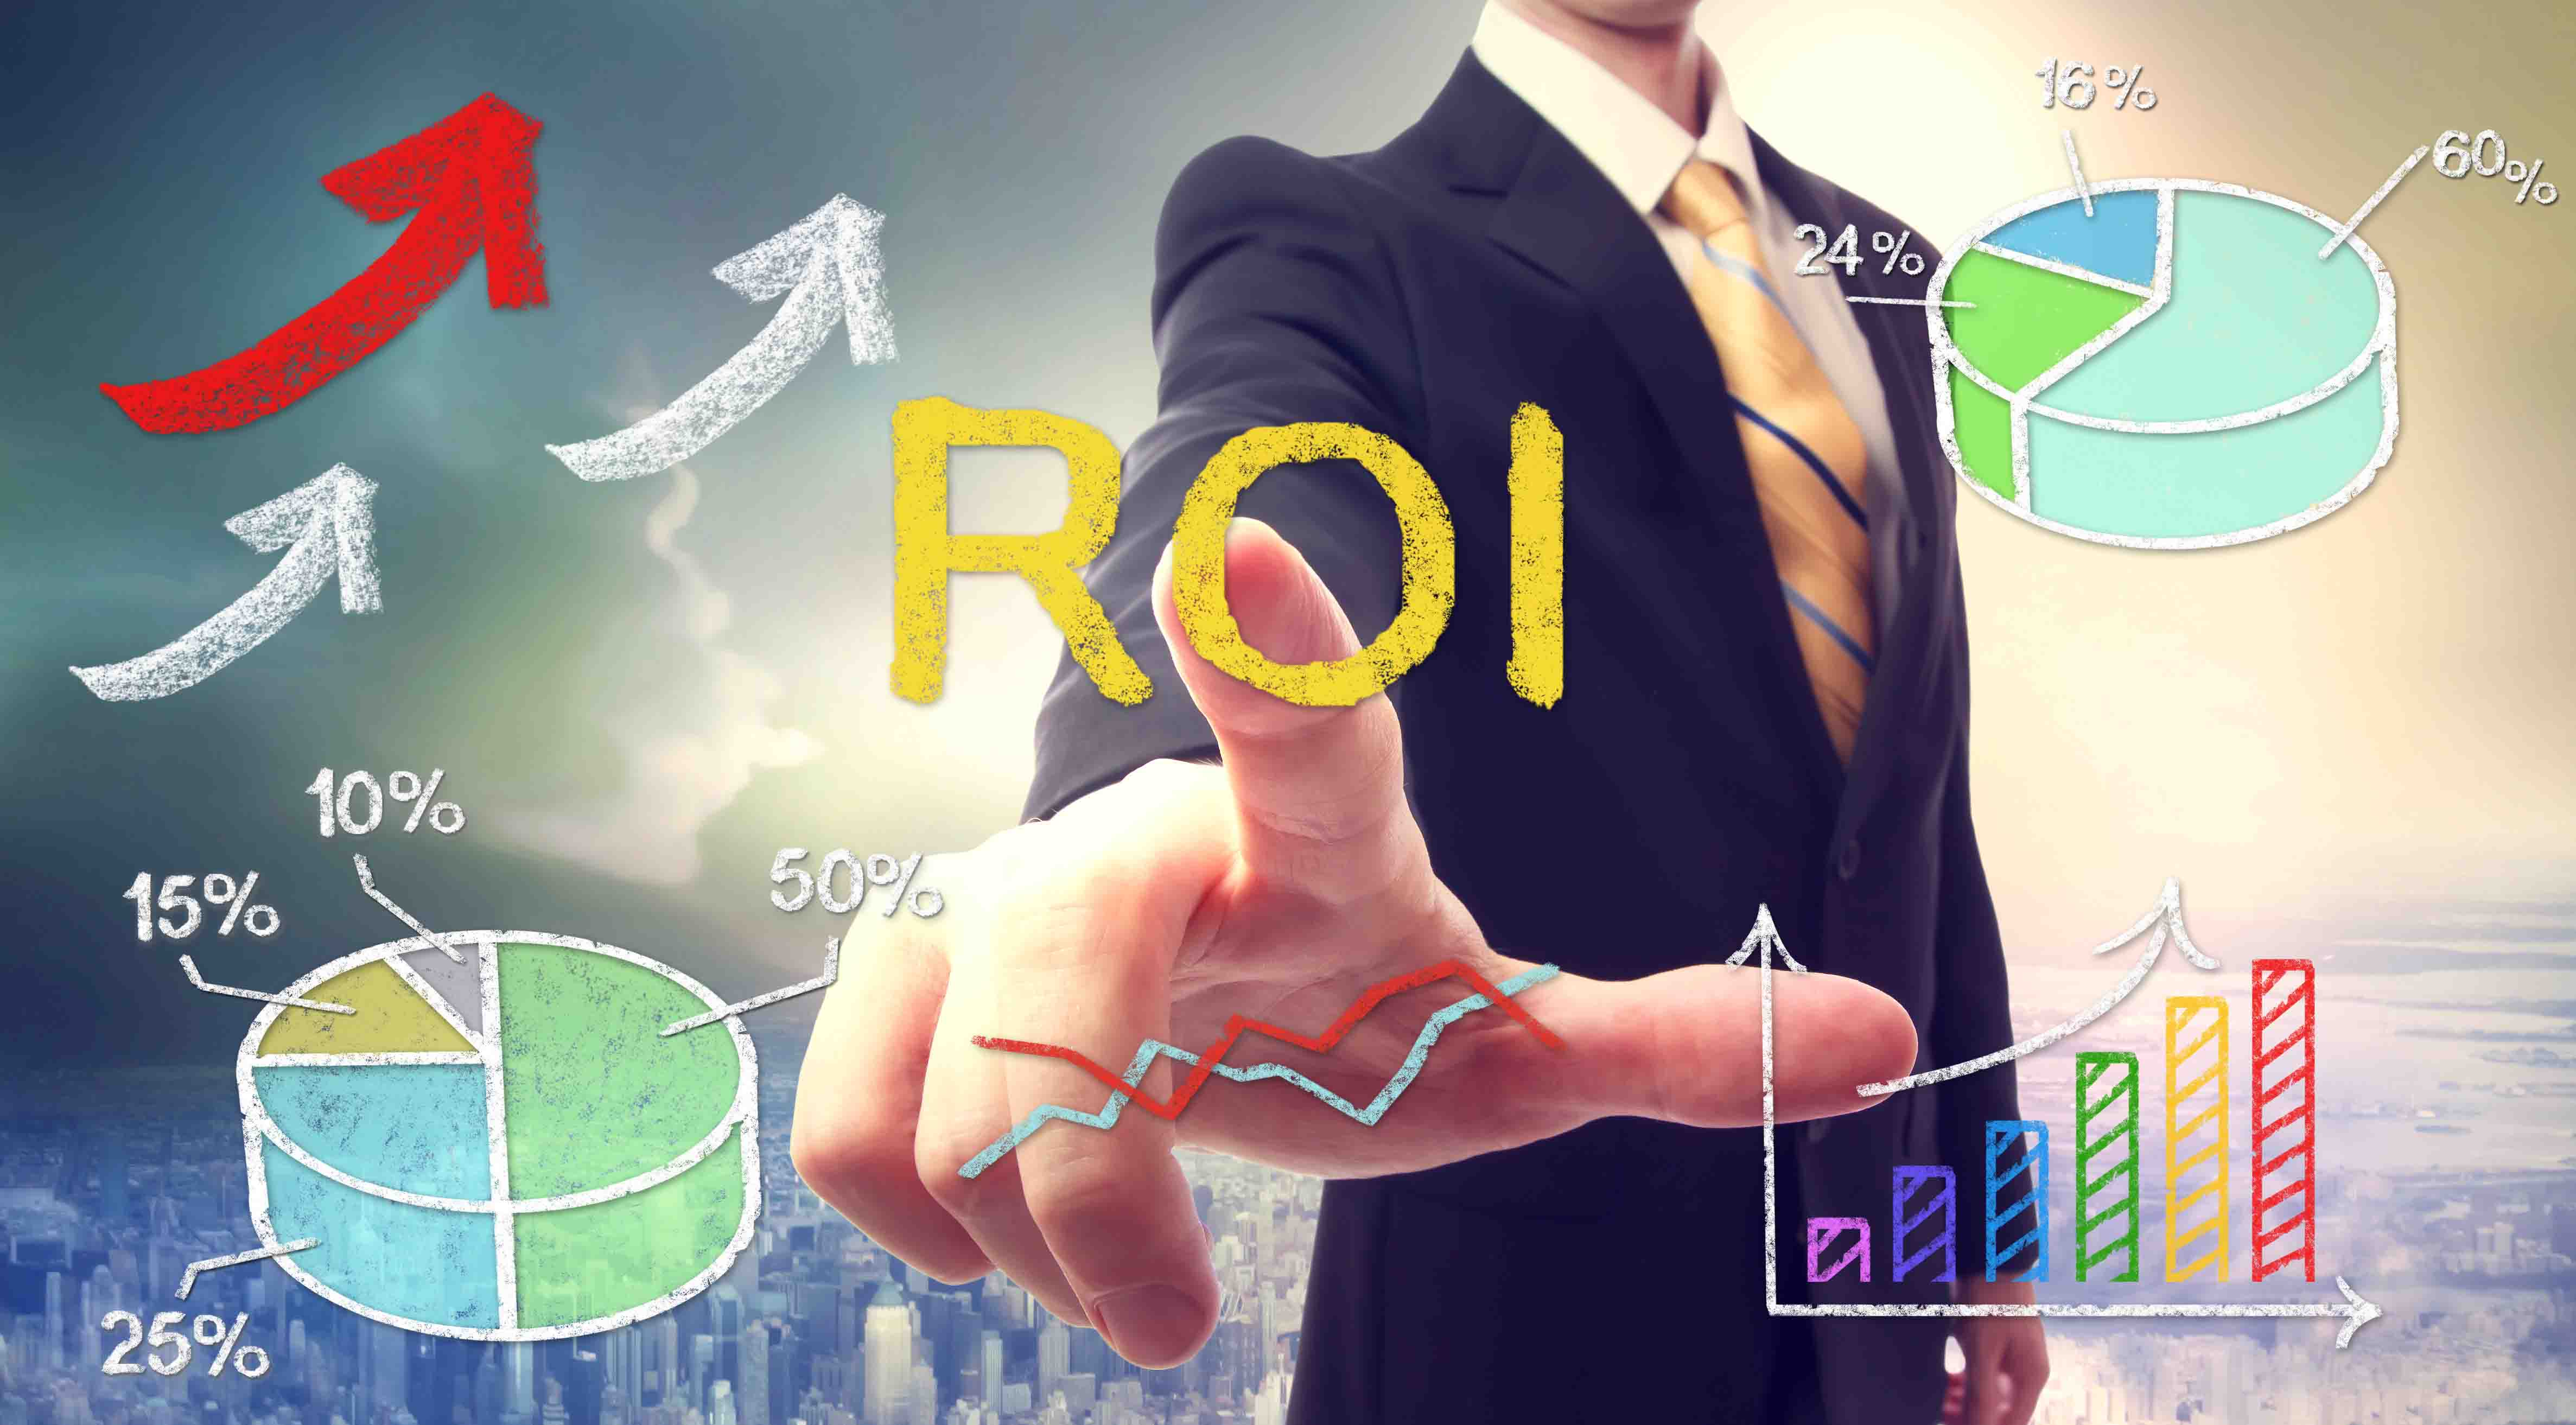 Businessman touching ROI (return on investment) over skyline background